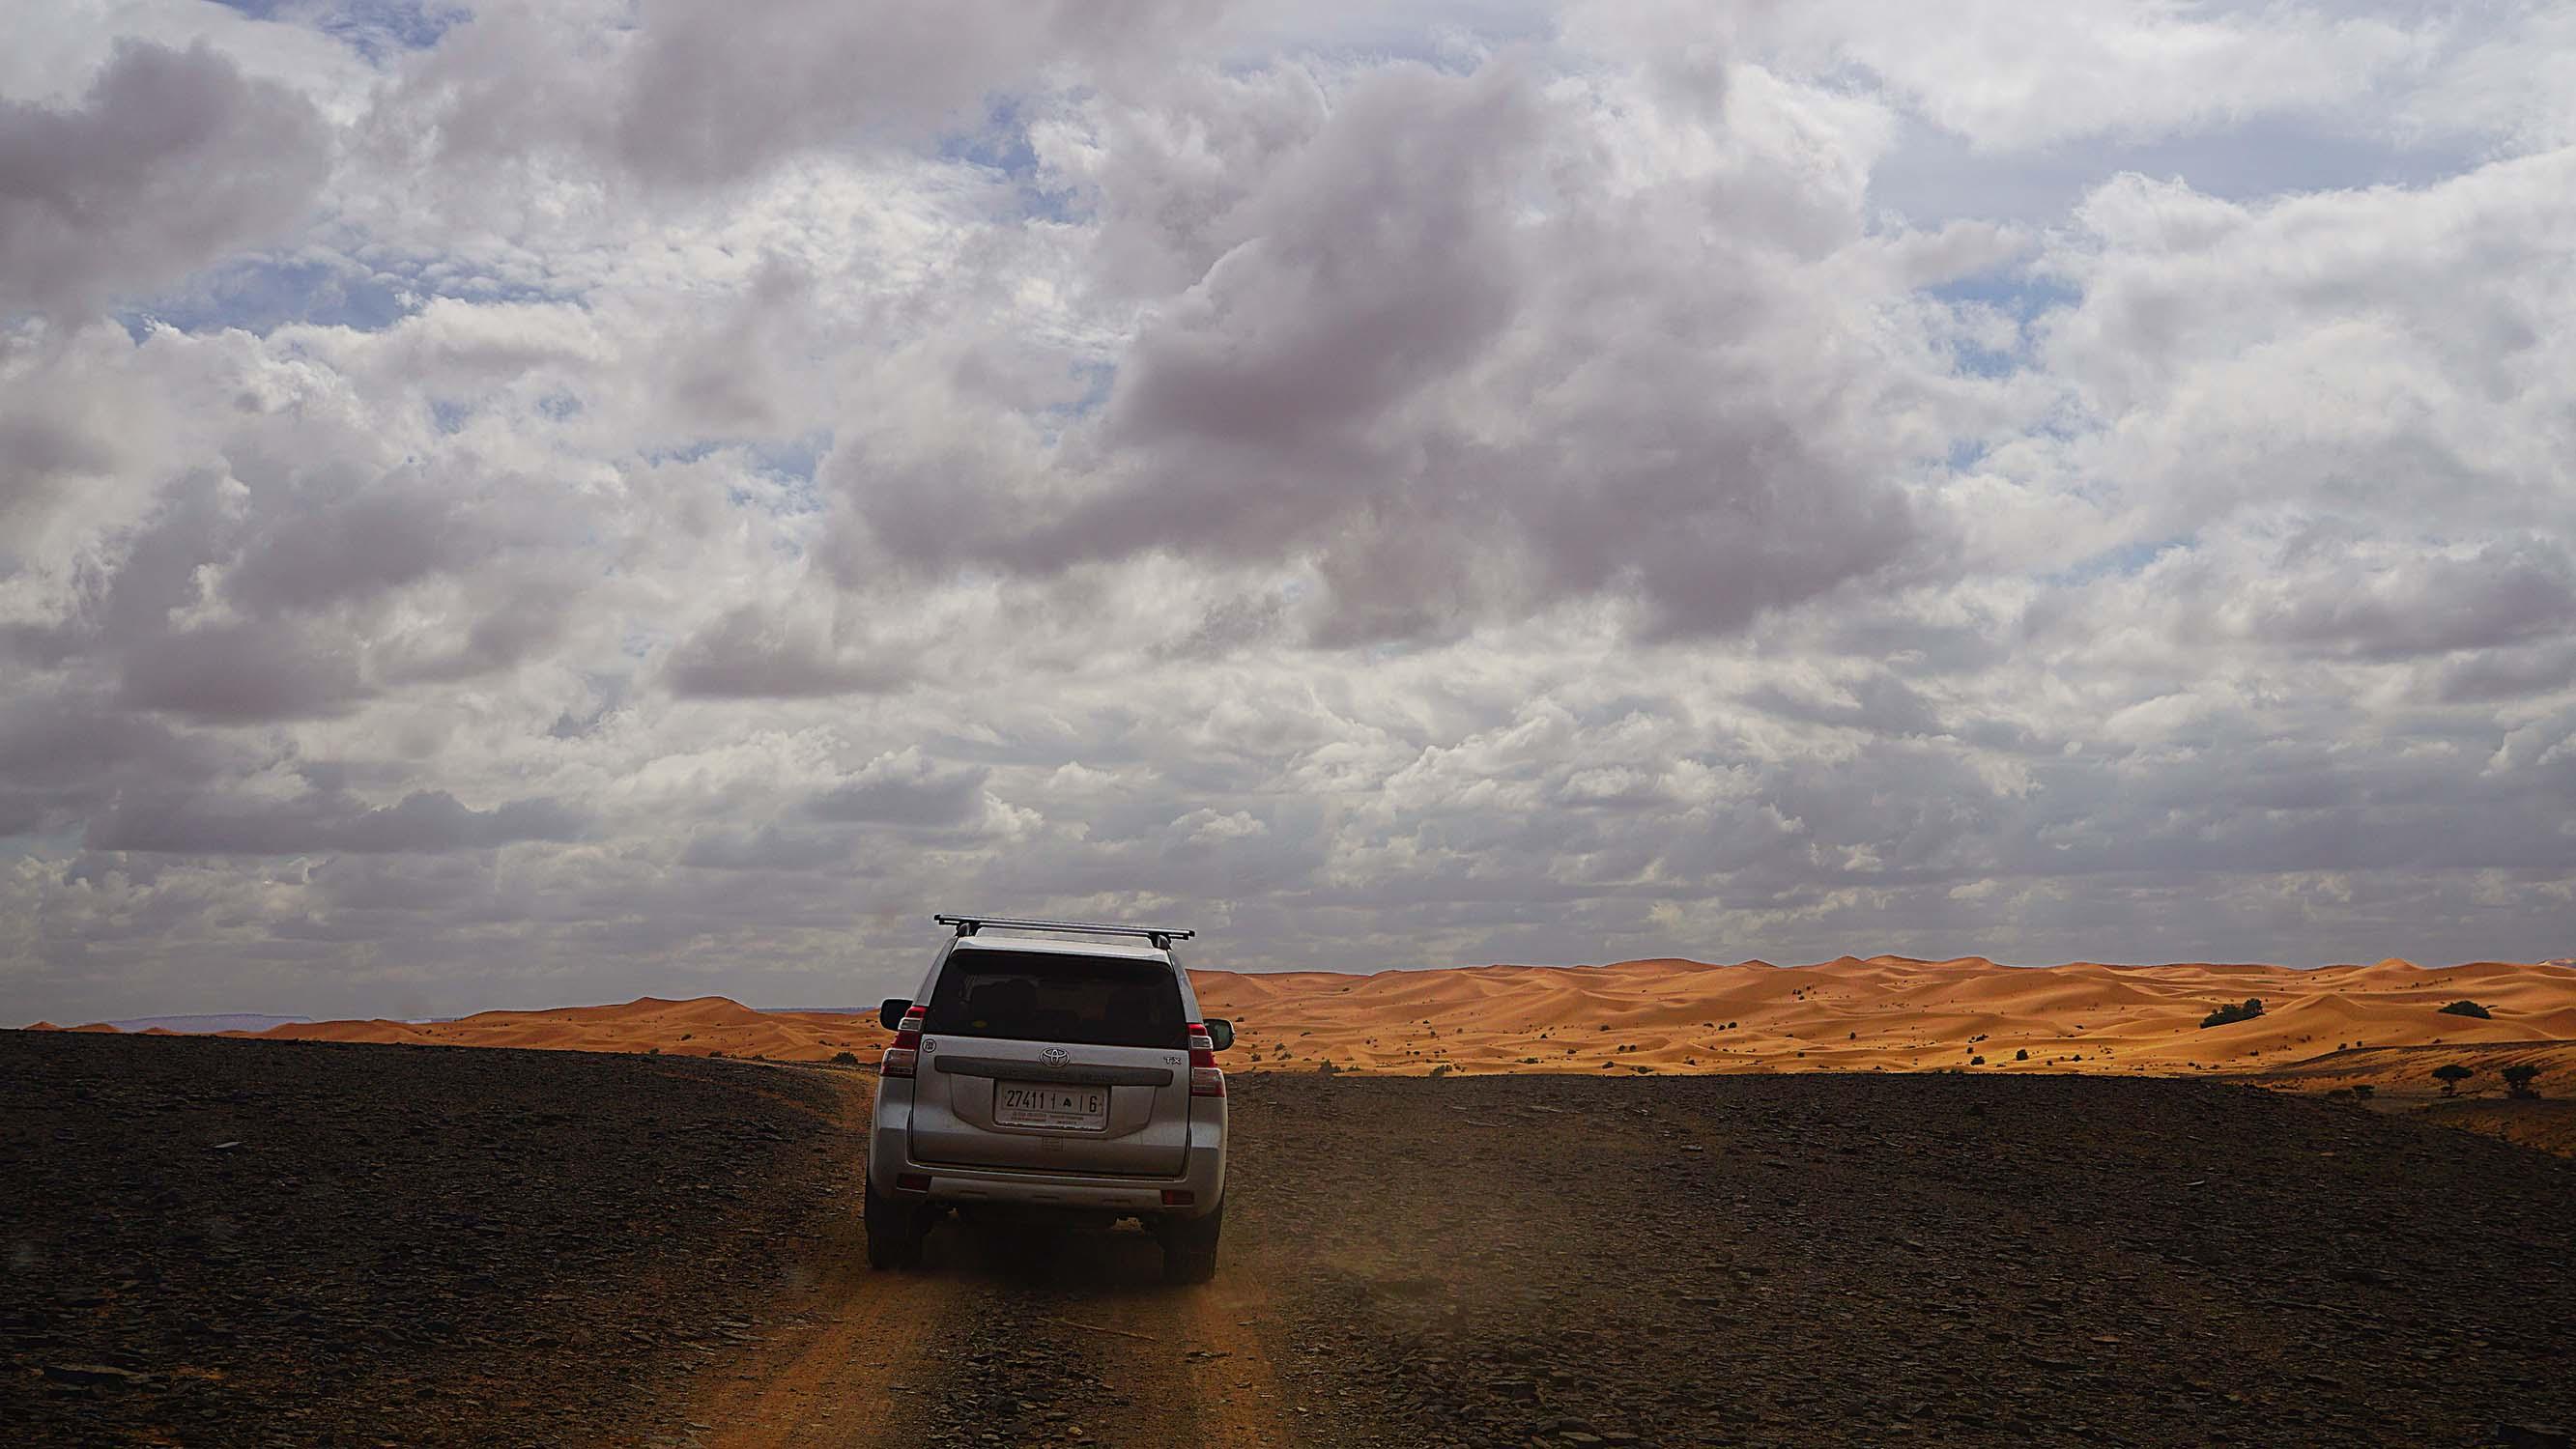 Marocco - deserto - Erg Chebbi